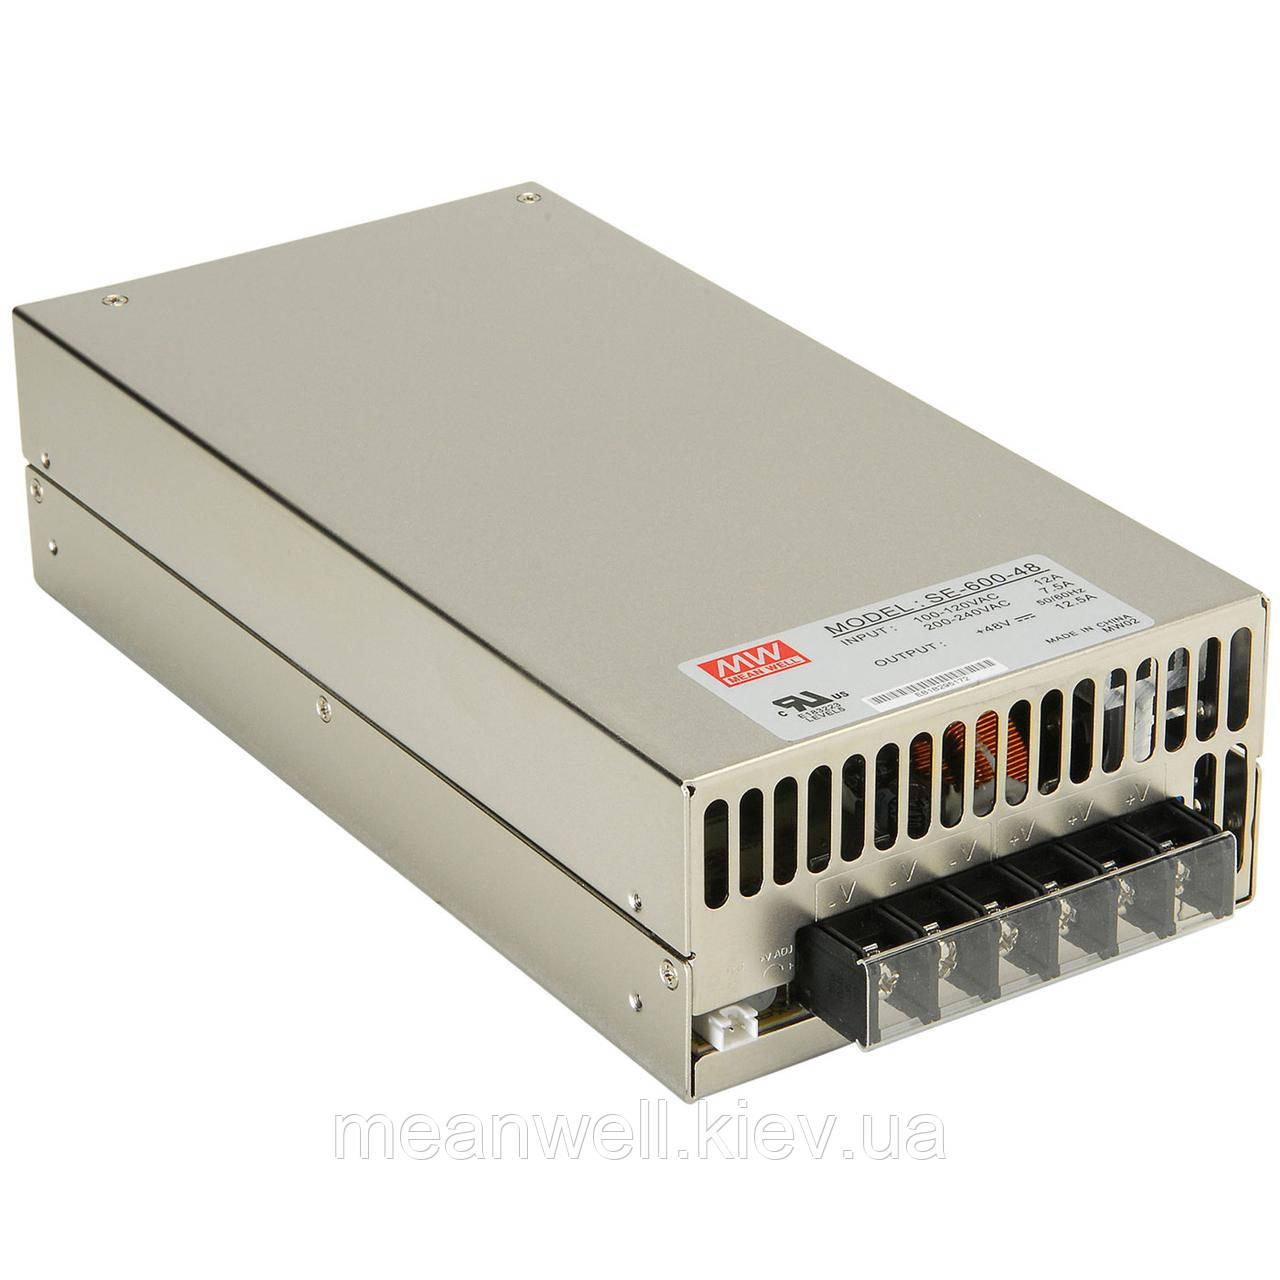 SE-600-15 Блок питания Mean Well  600 вт,15 в, 40 А